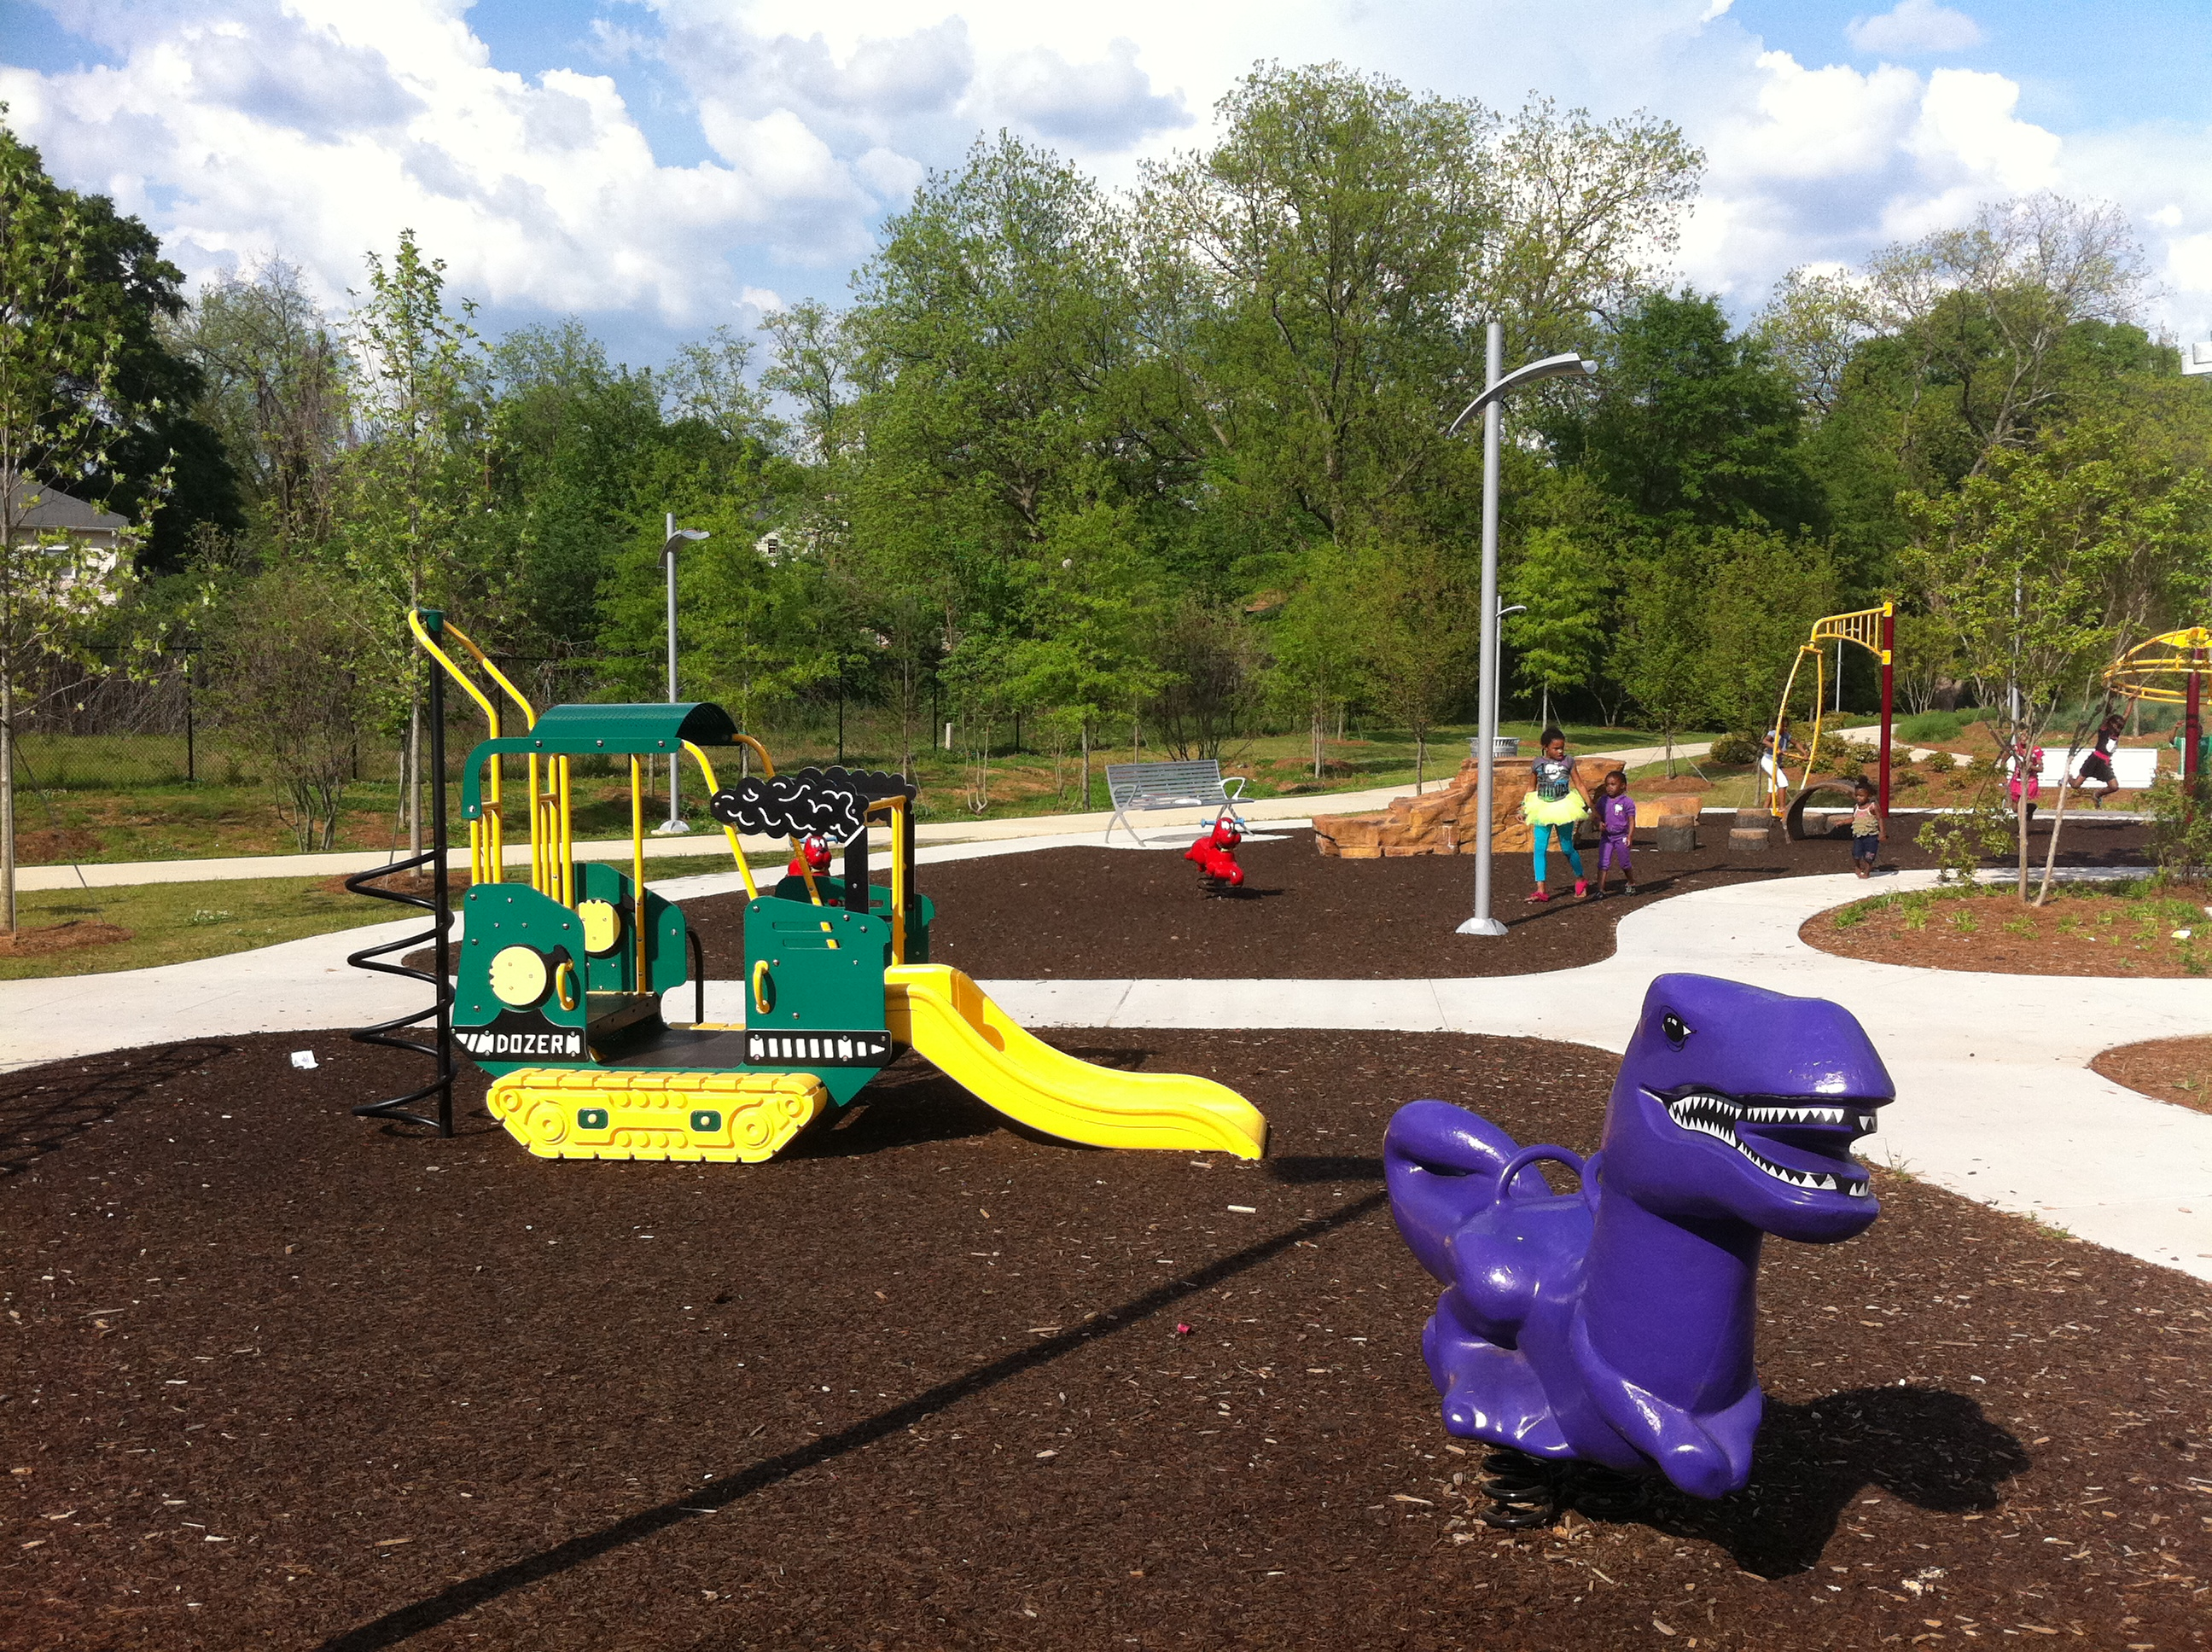 Home Park Atlanta Crime Img Source Abuse Report